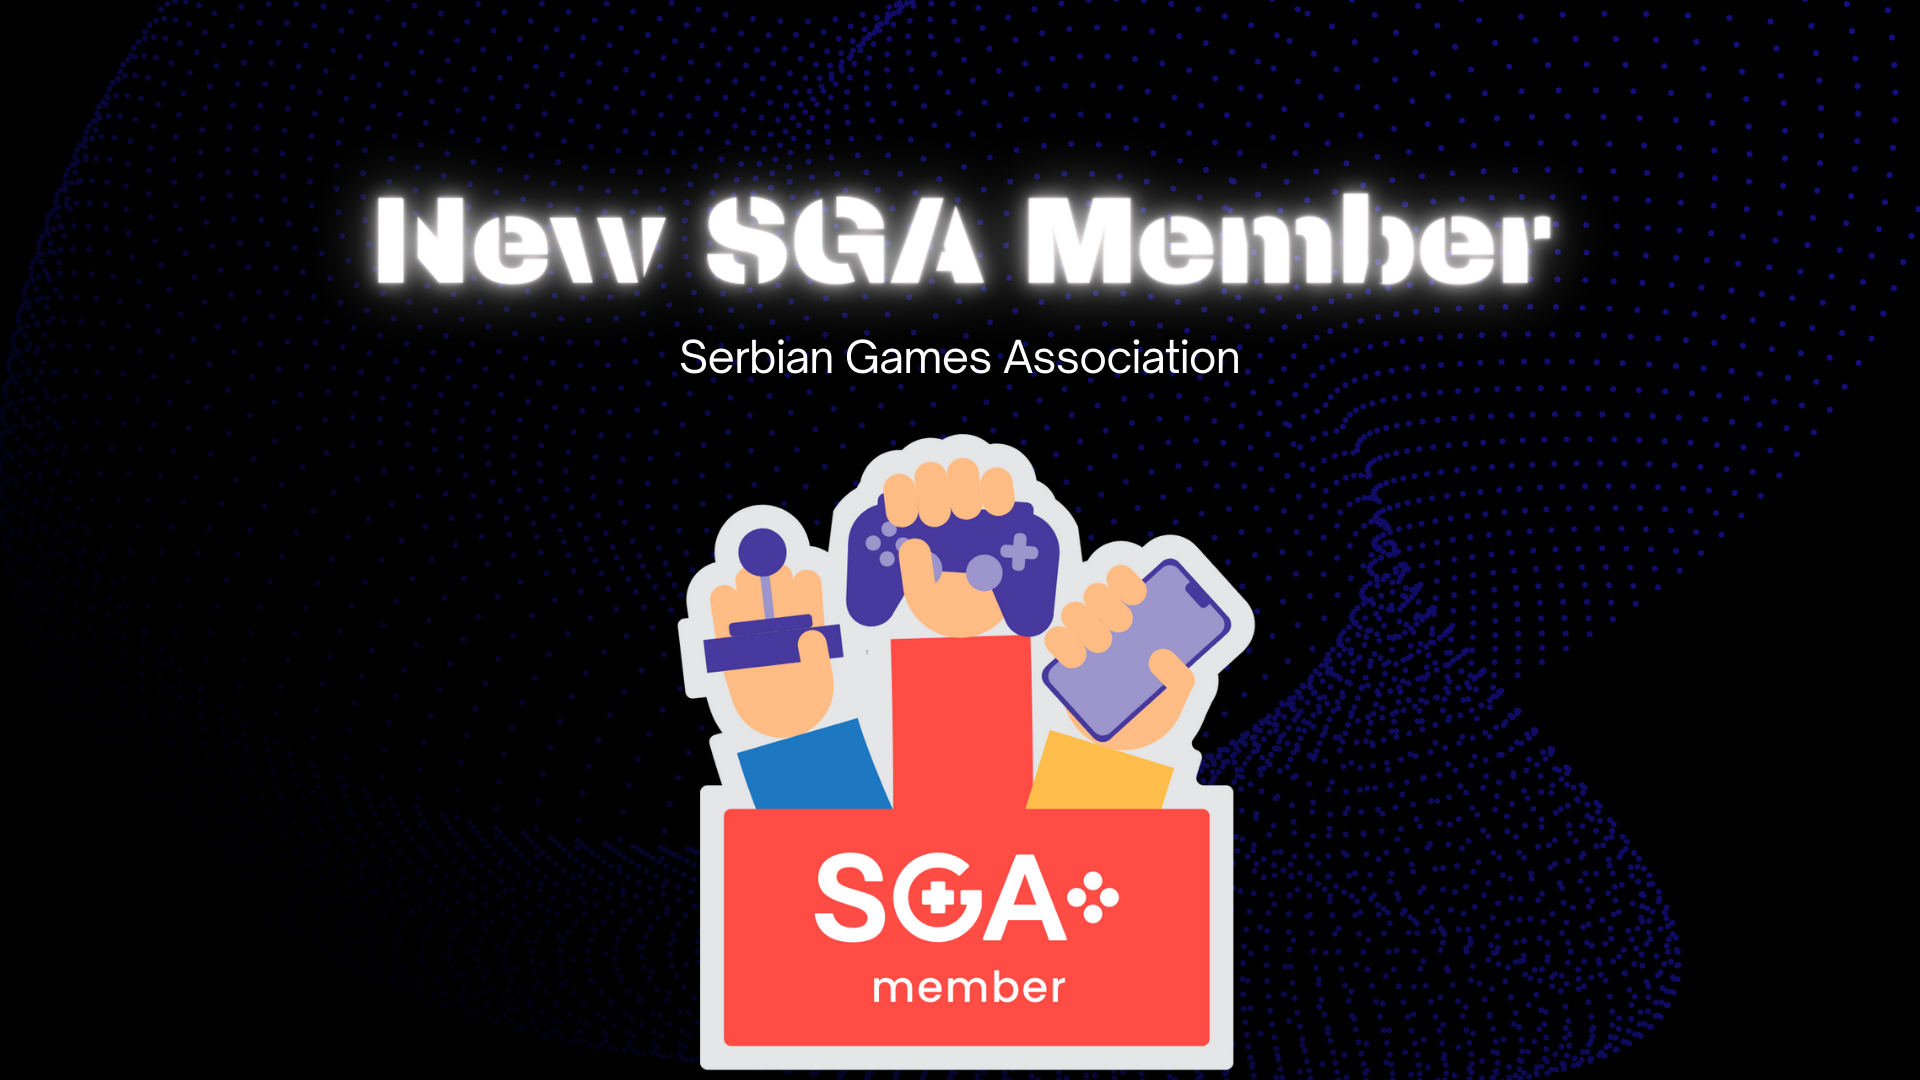 An images showing membership in Serbian Games Association